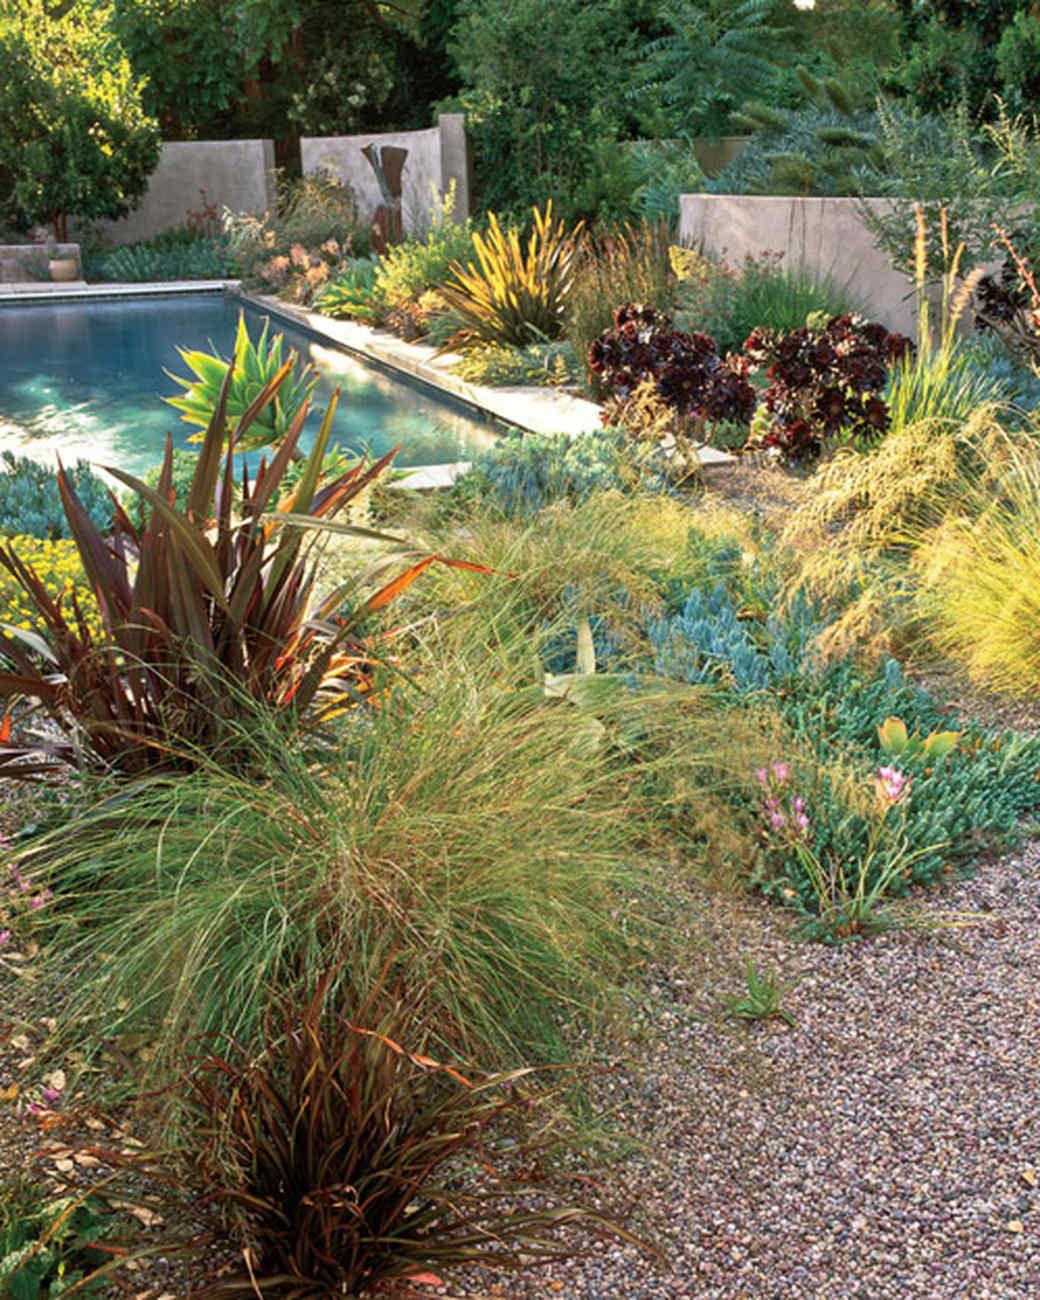 mla10490_0809_vought_garden3.jpg